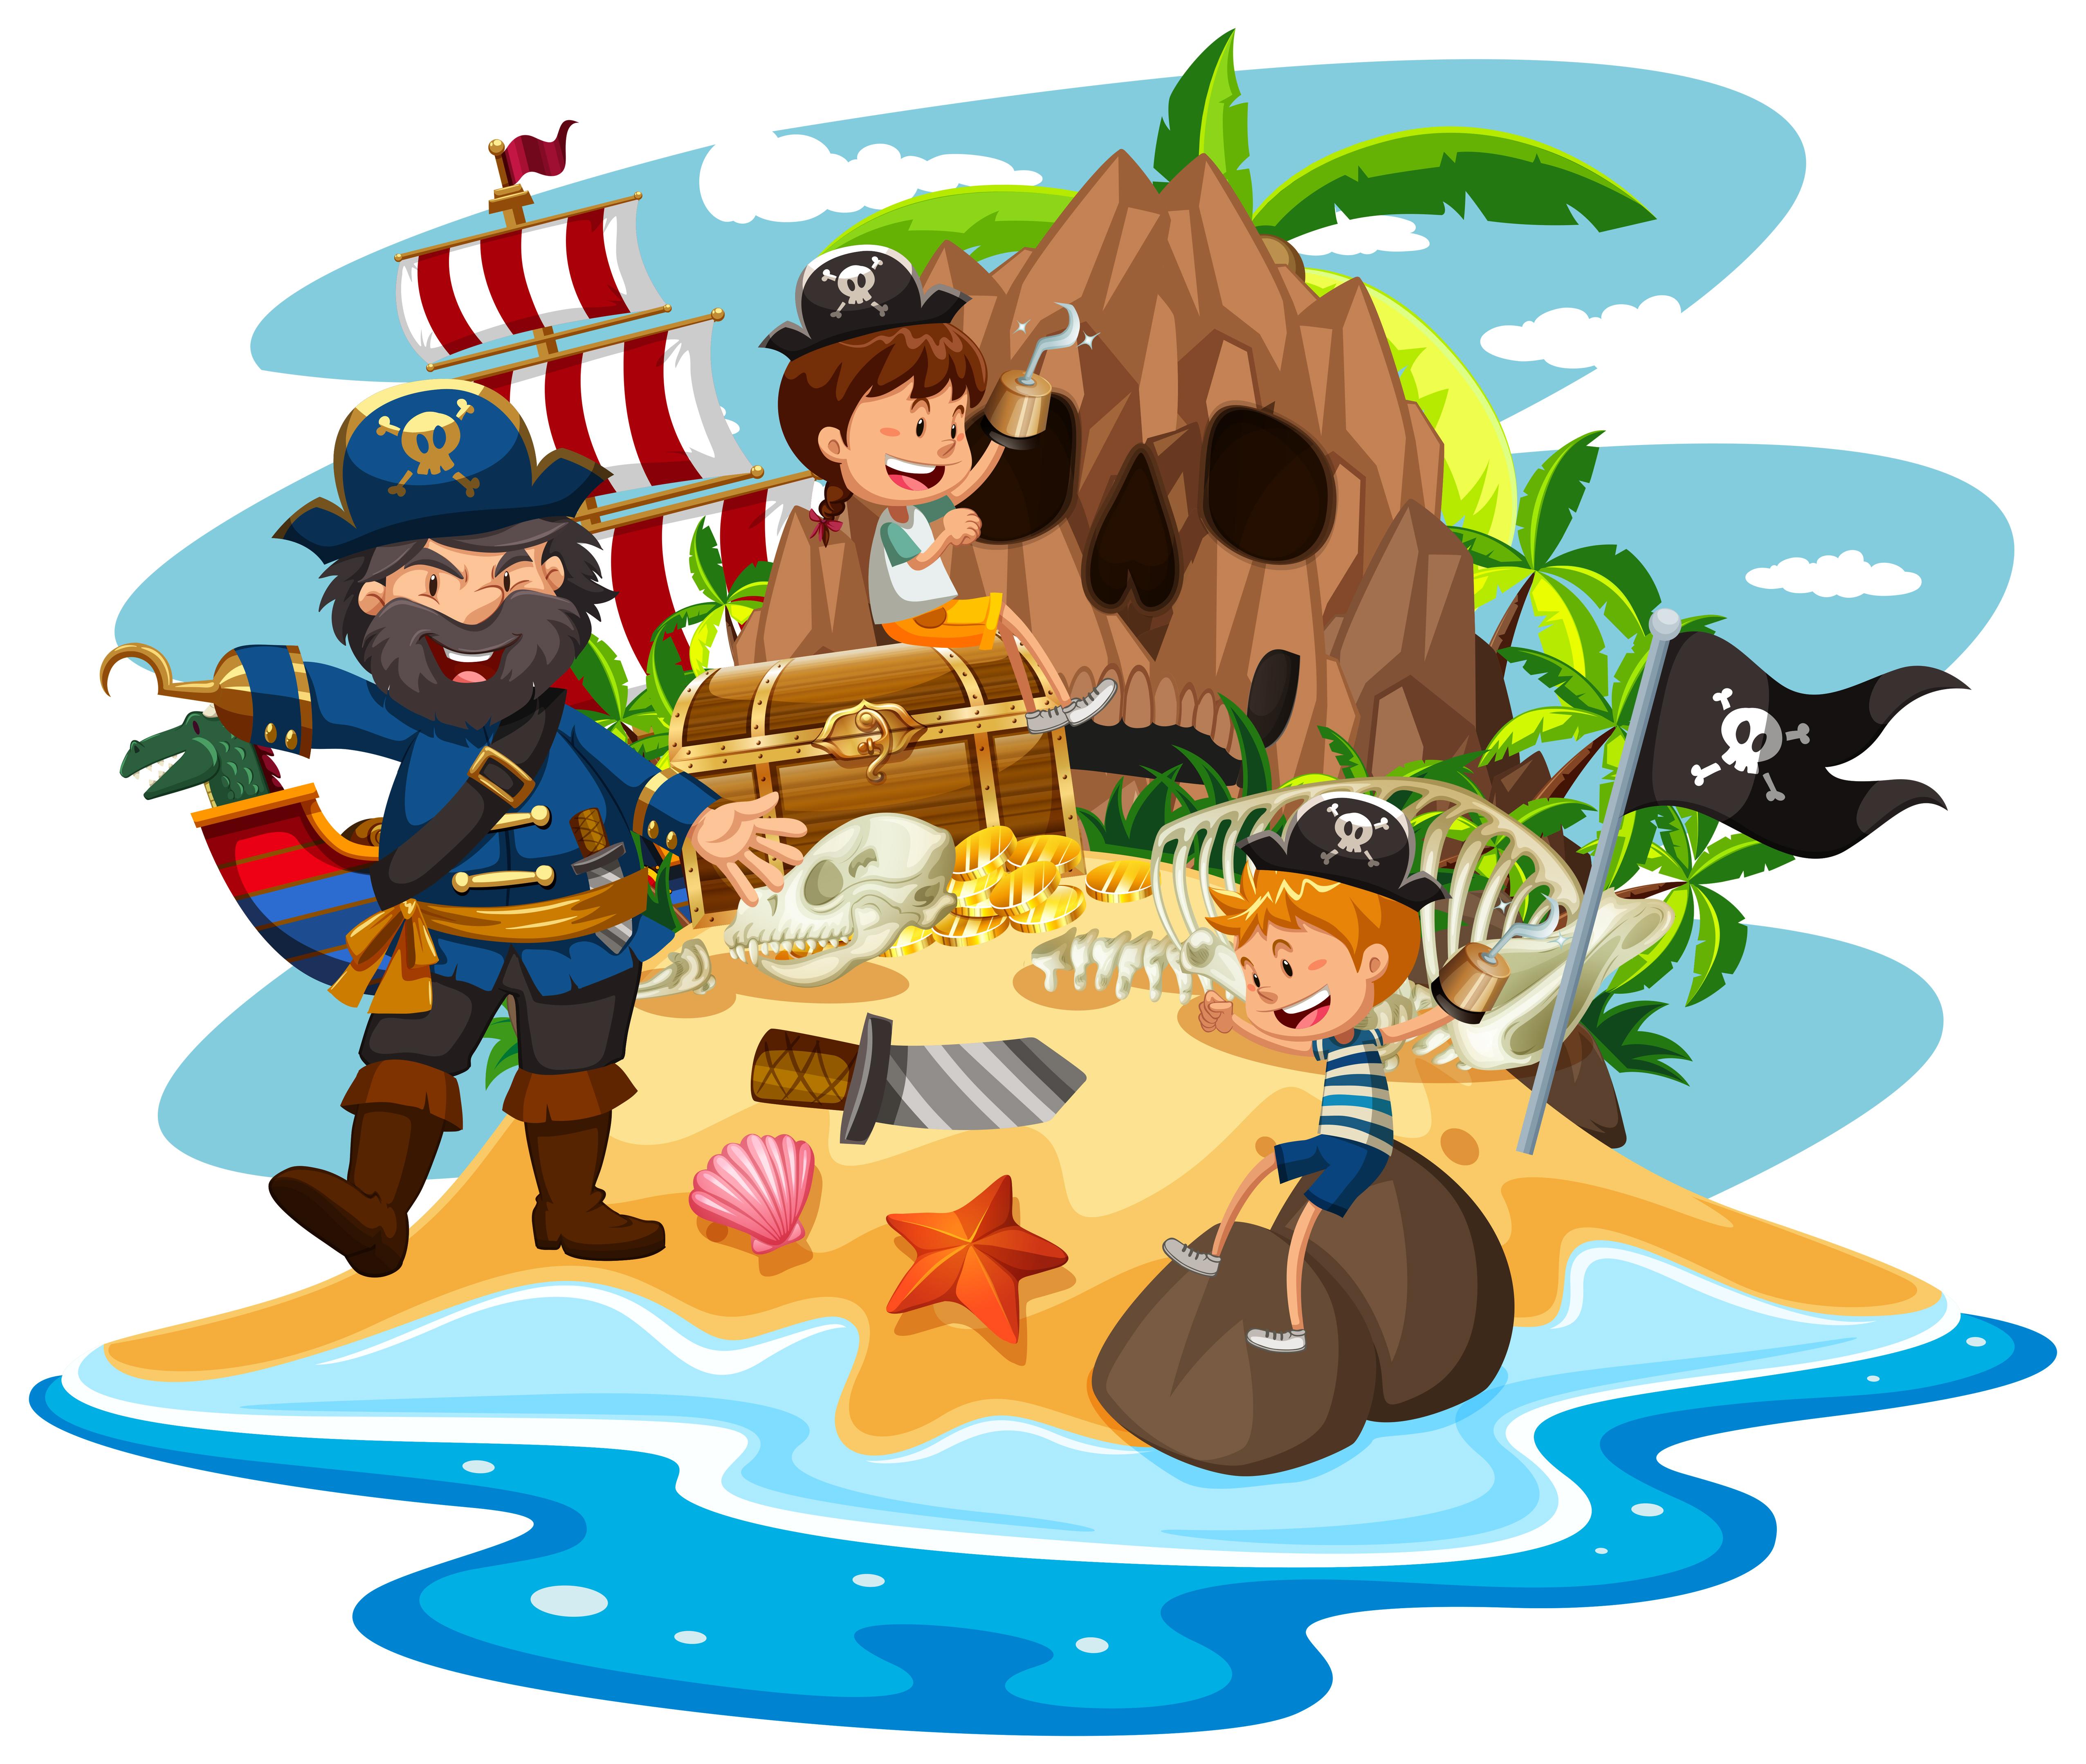 ocean scene with pirate and children on treasure island